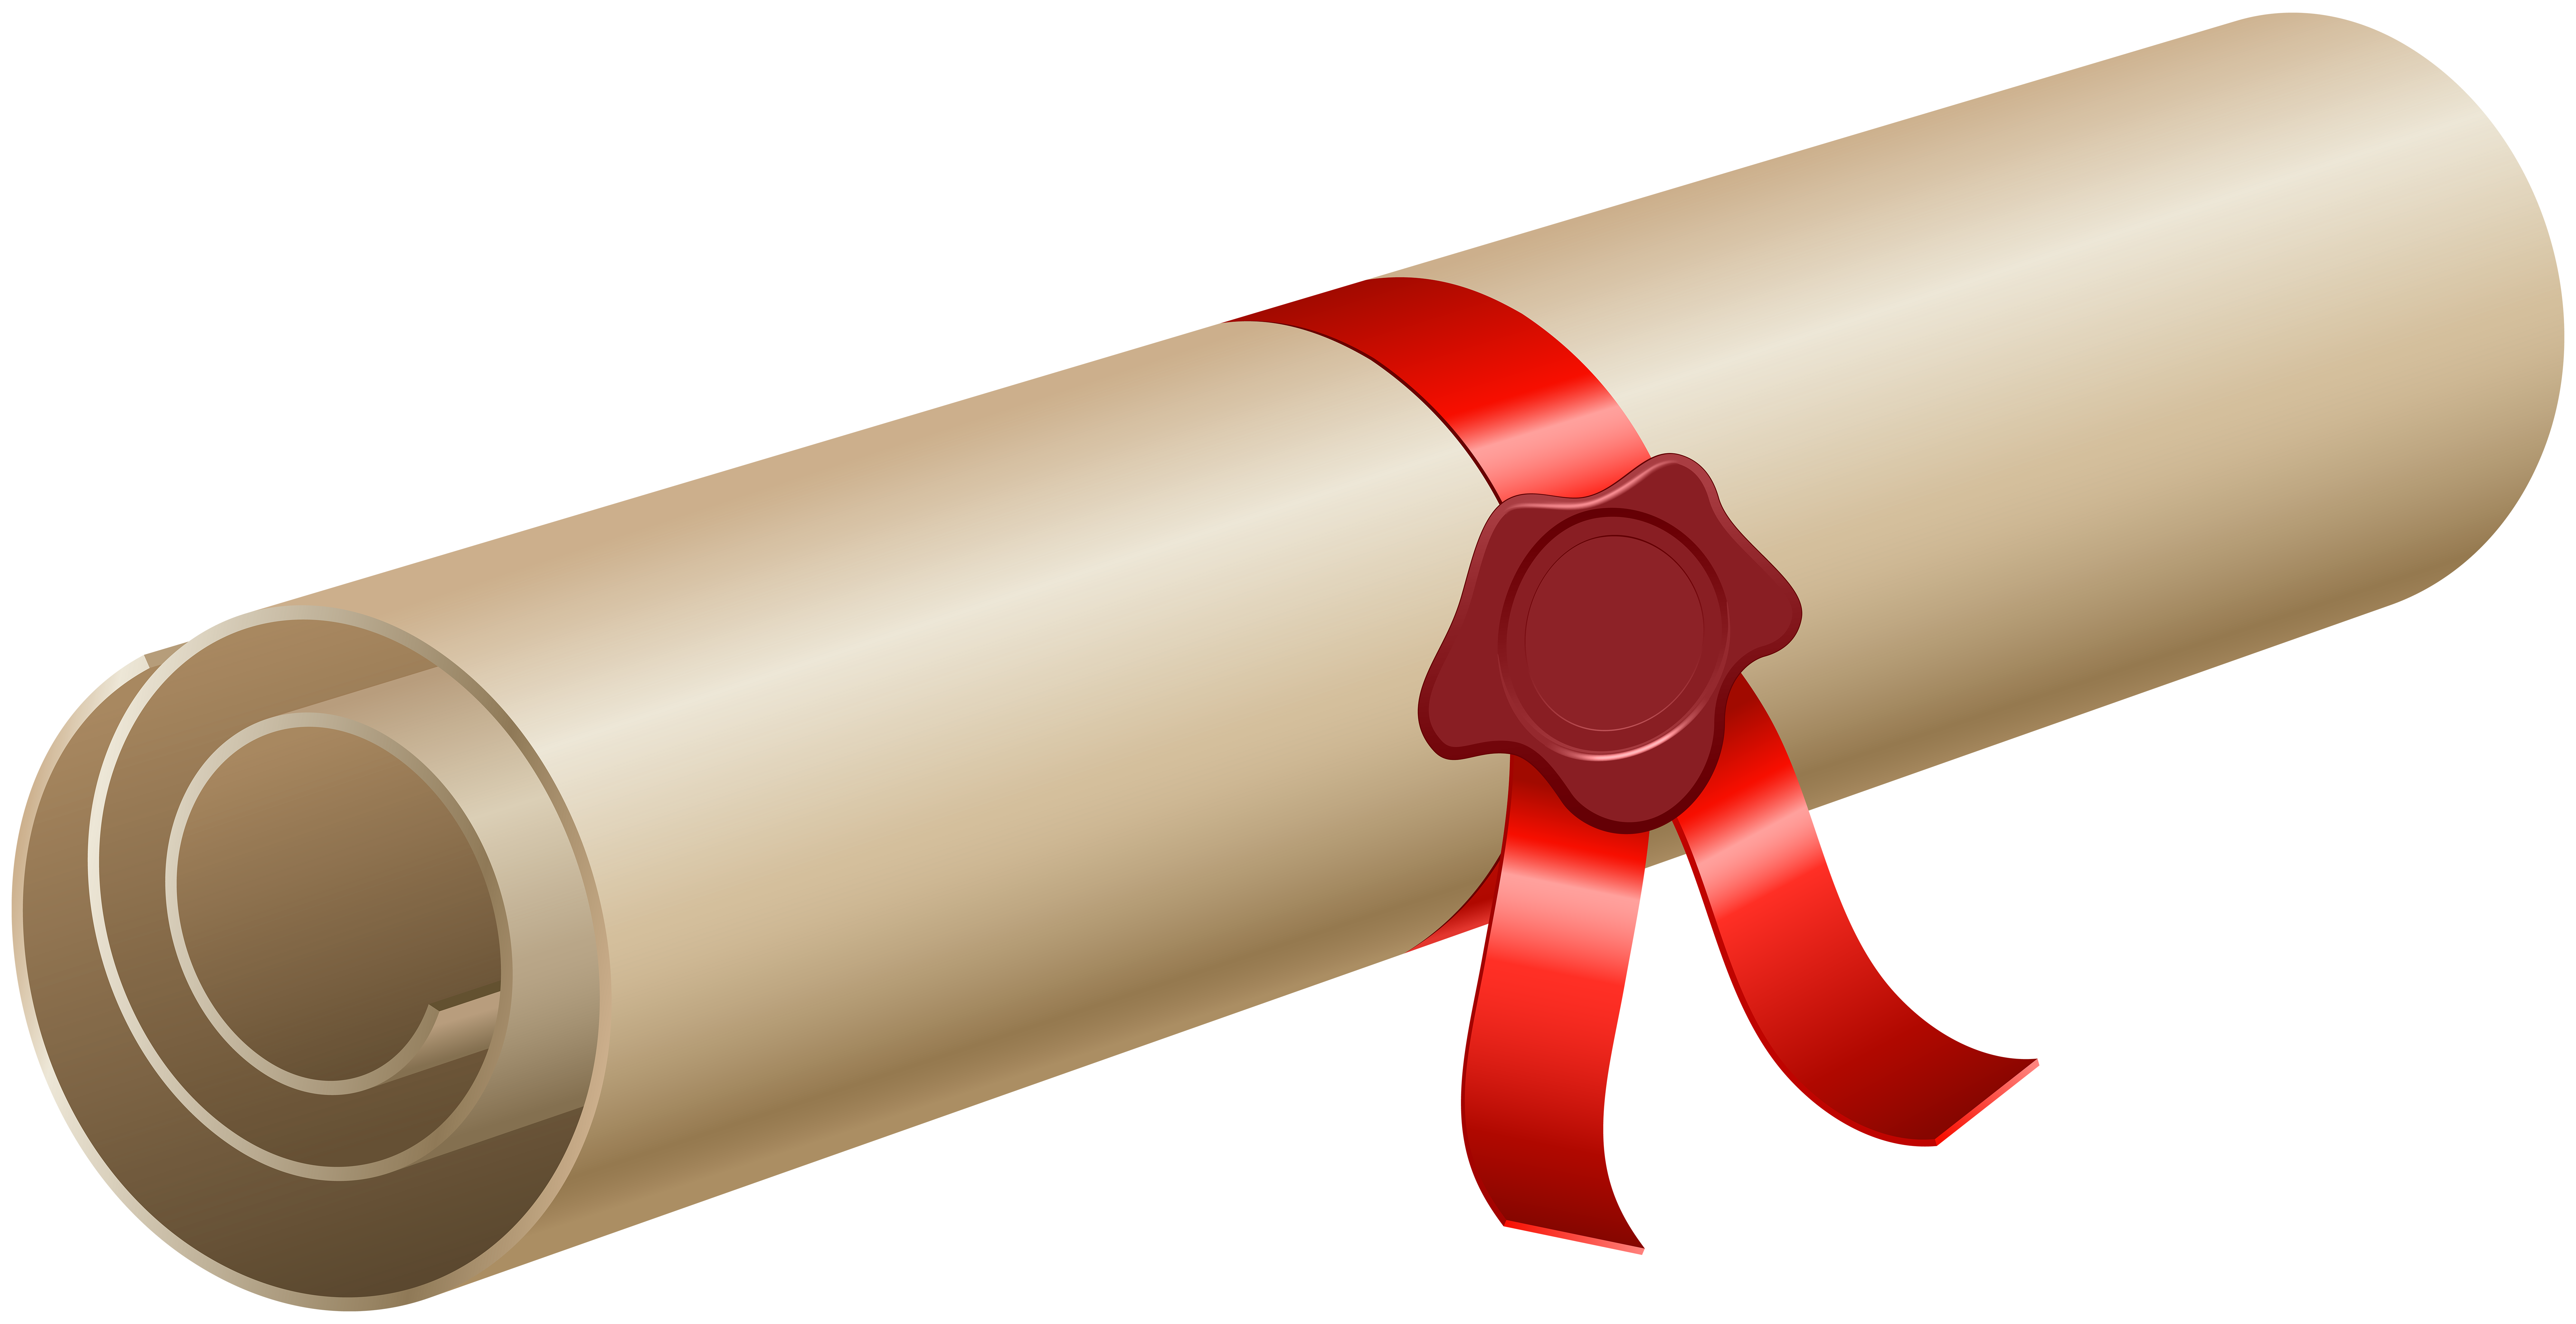 Diploma clipart transparent background. Png clip art image